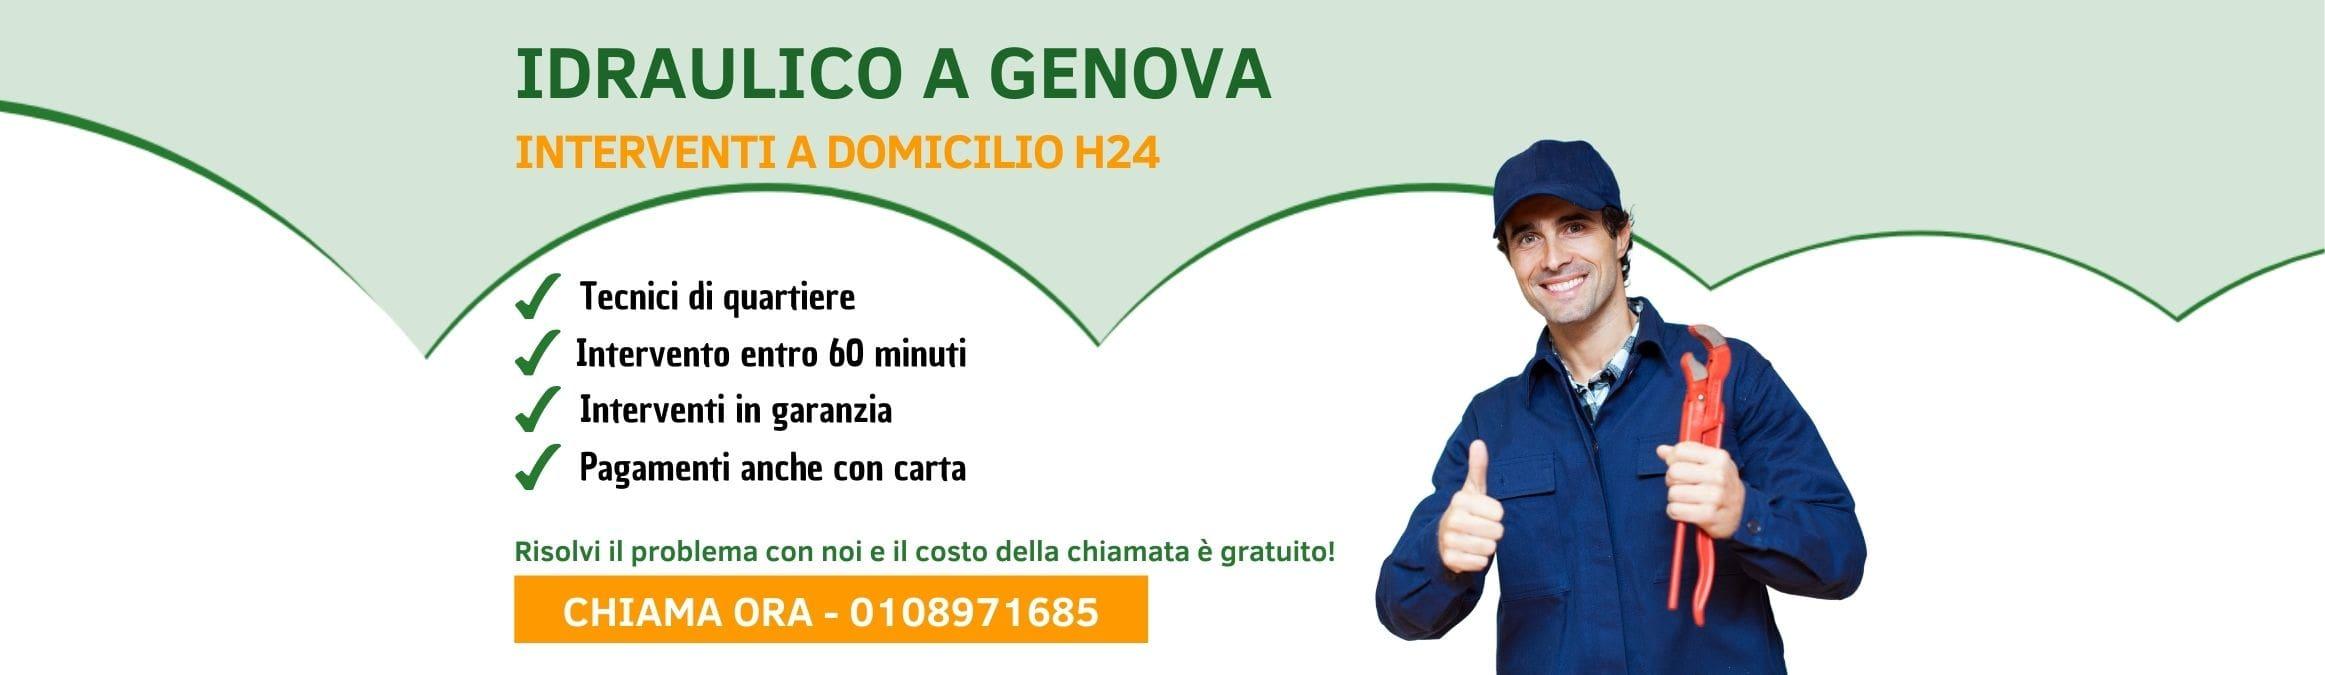 Idraulico Genova - Pronto Intervento Idraulico h24